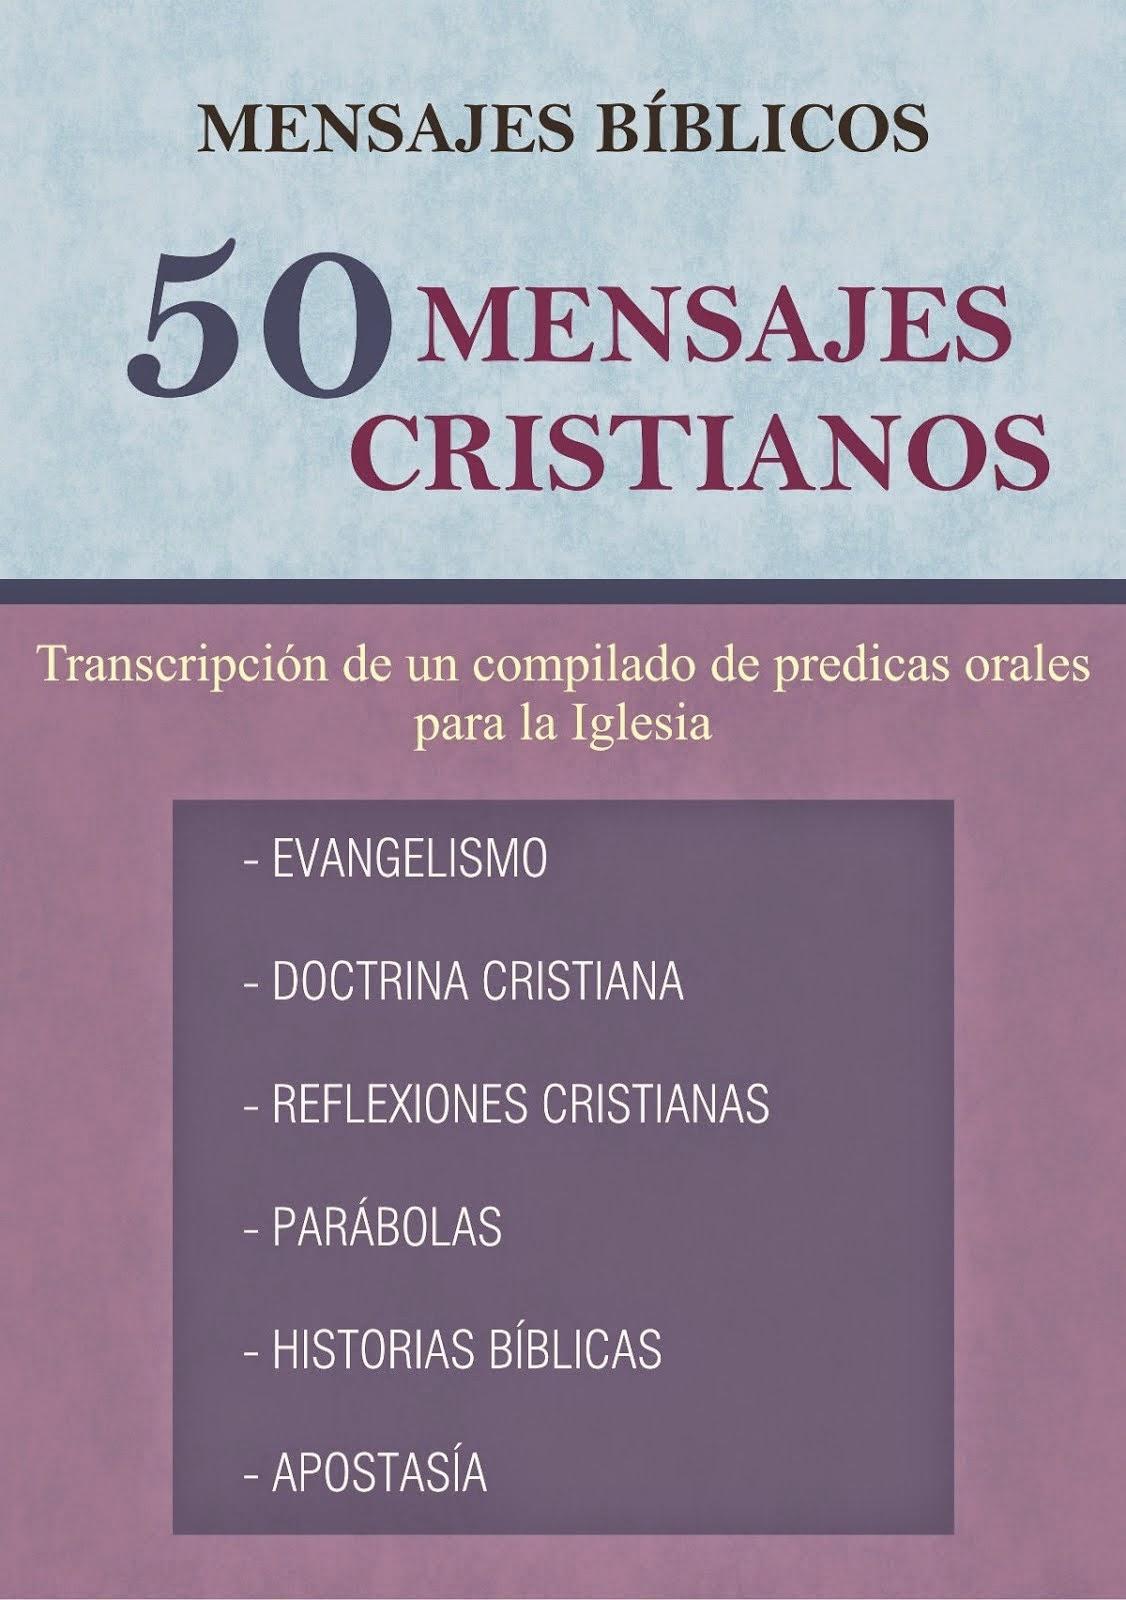 PDF: 50 Mensajes Cristianos